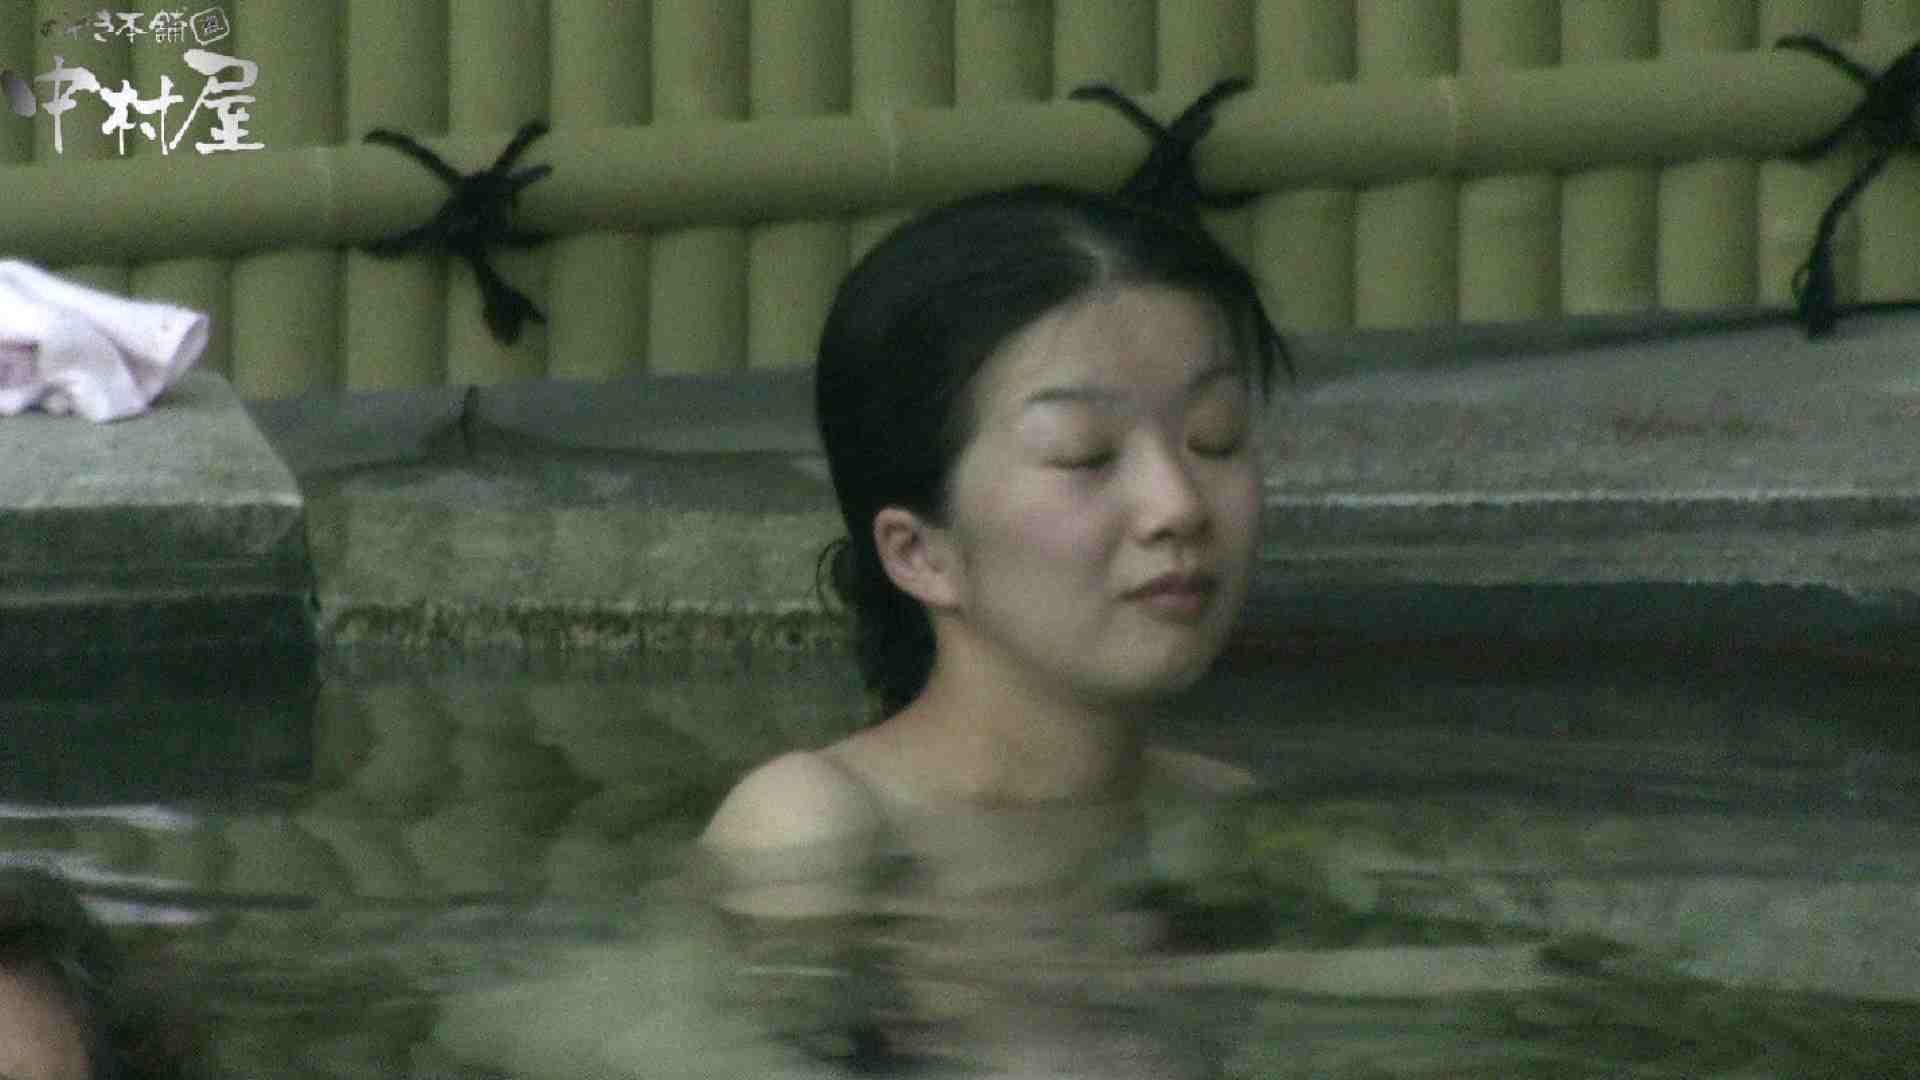 Aquaな露天風呂Vol.904 盗撮師作品  103pic 102